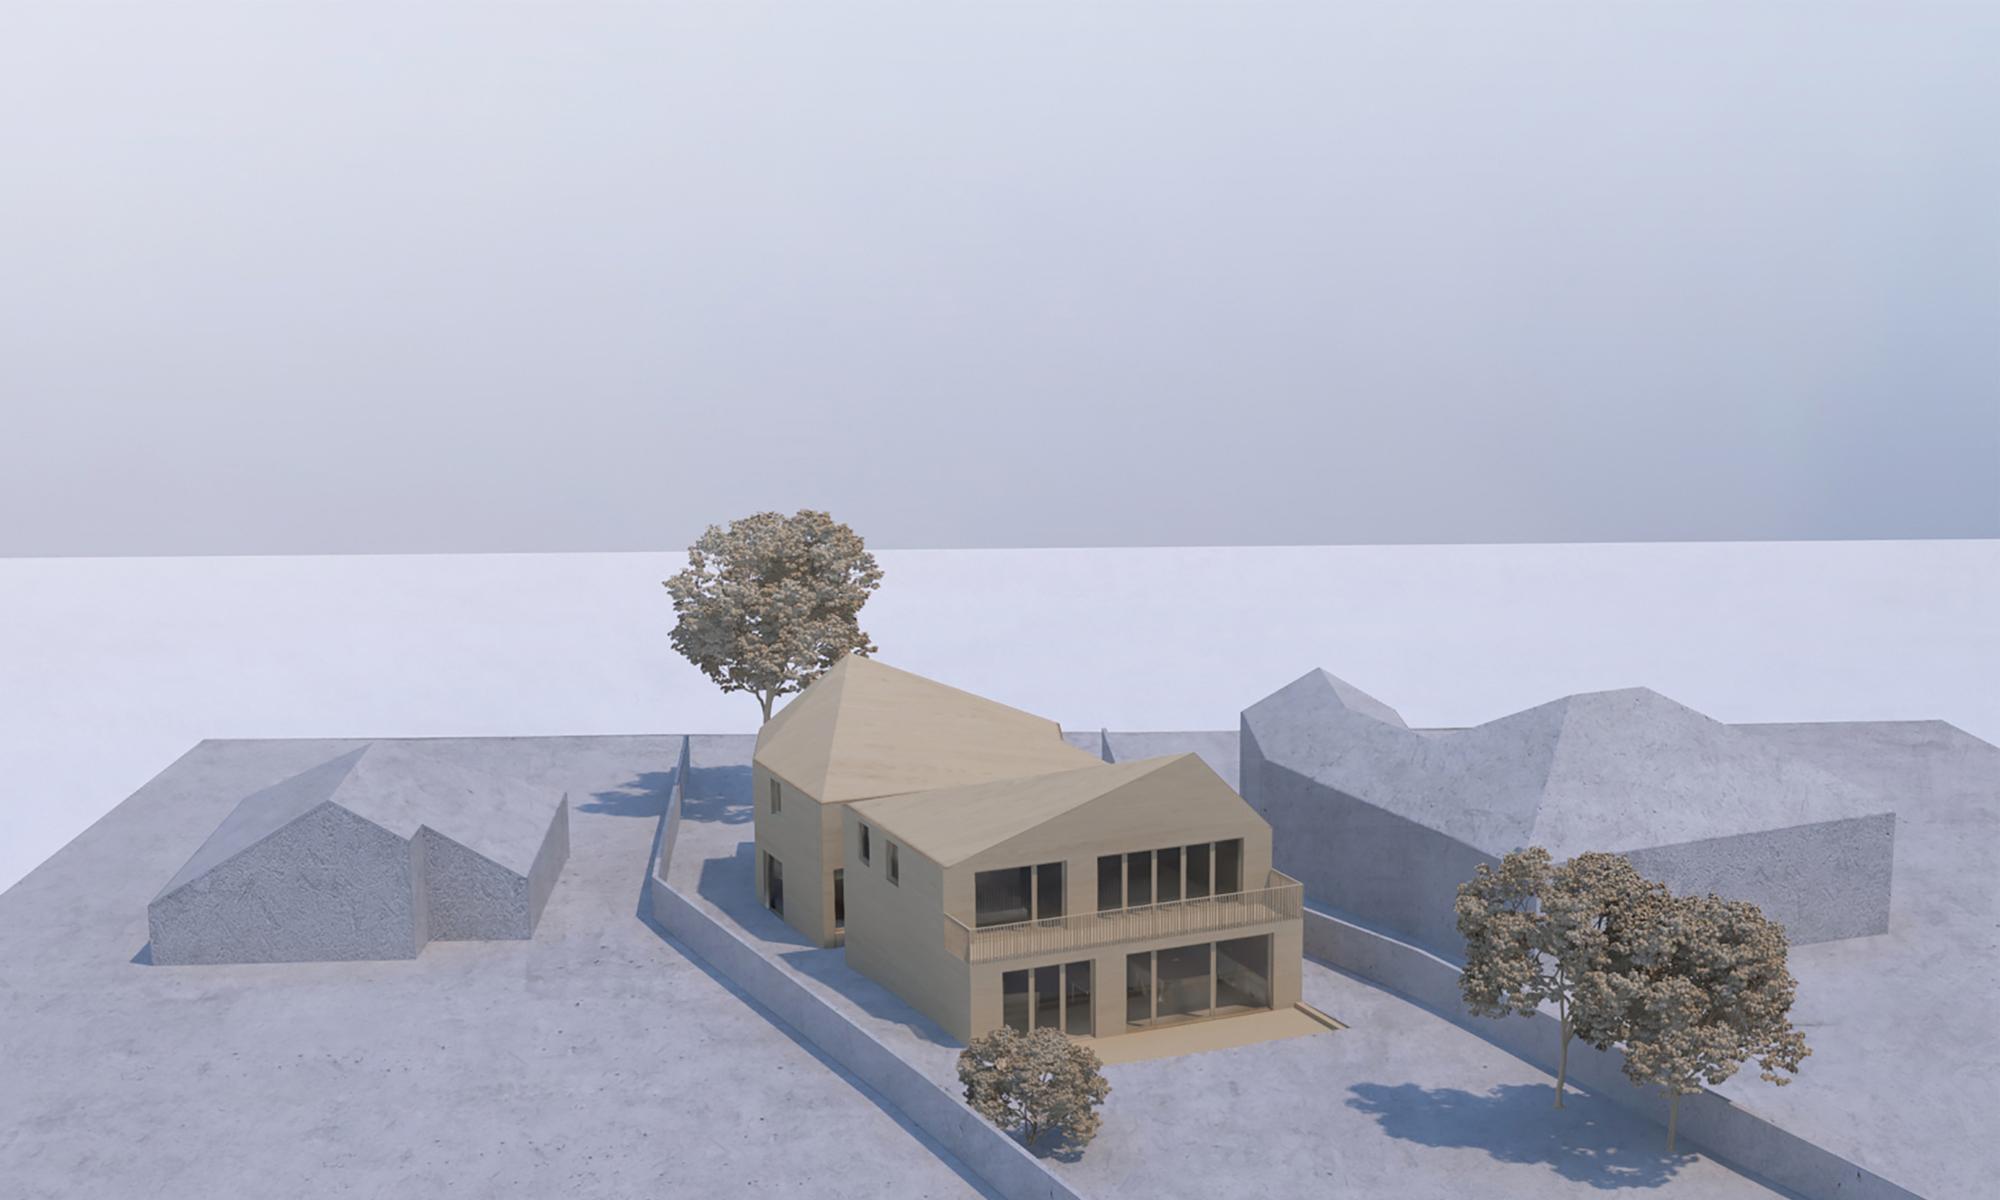 New build model concept 5